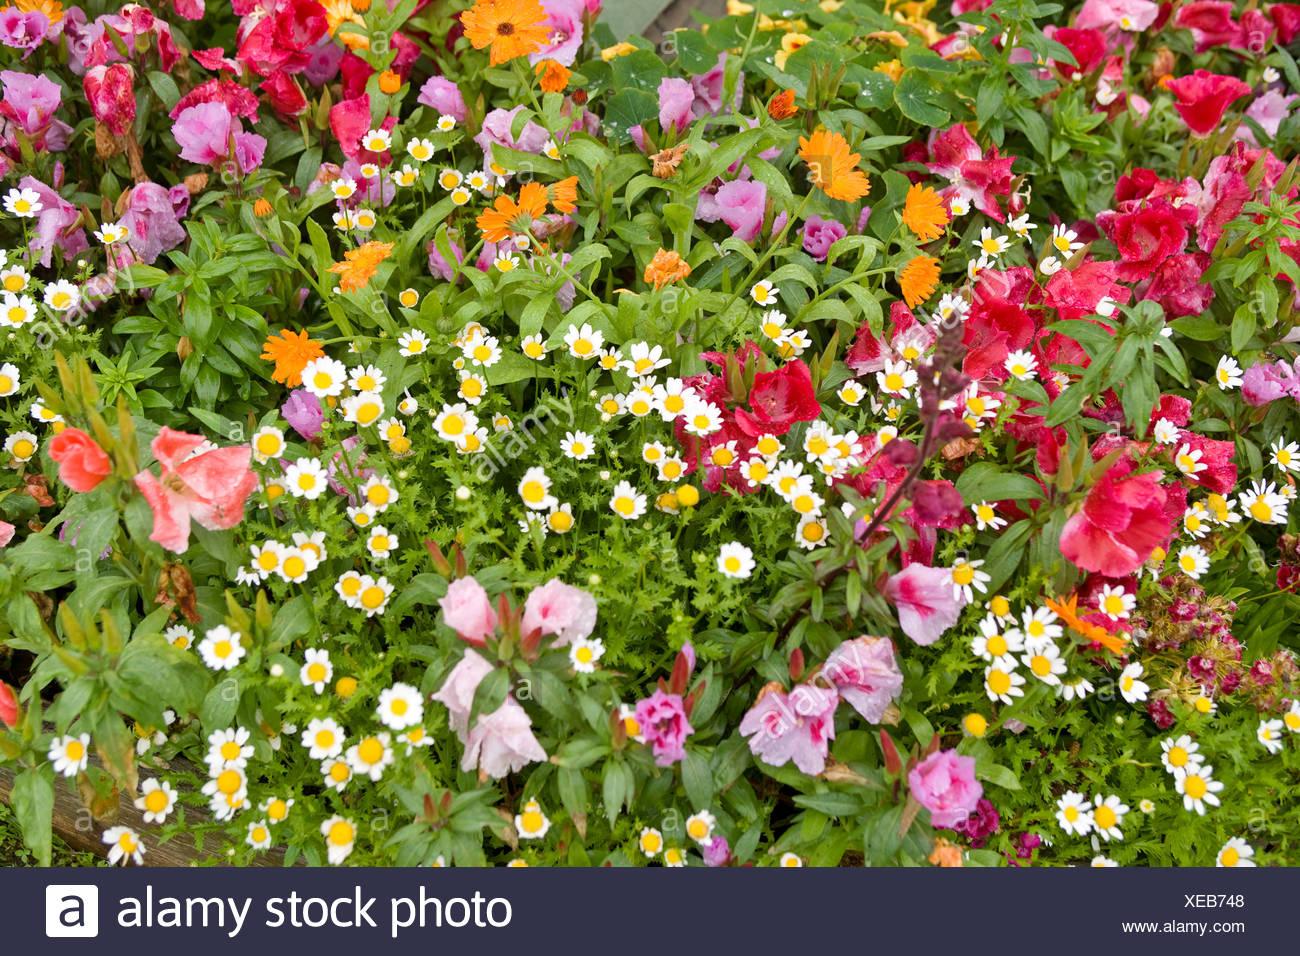 Colorful flowers at the Gustavus Inn at Gustavus, Alaska. - Stock Image